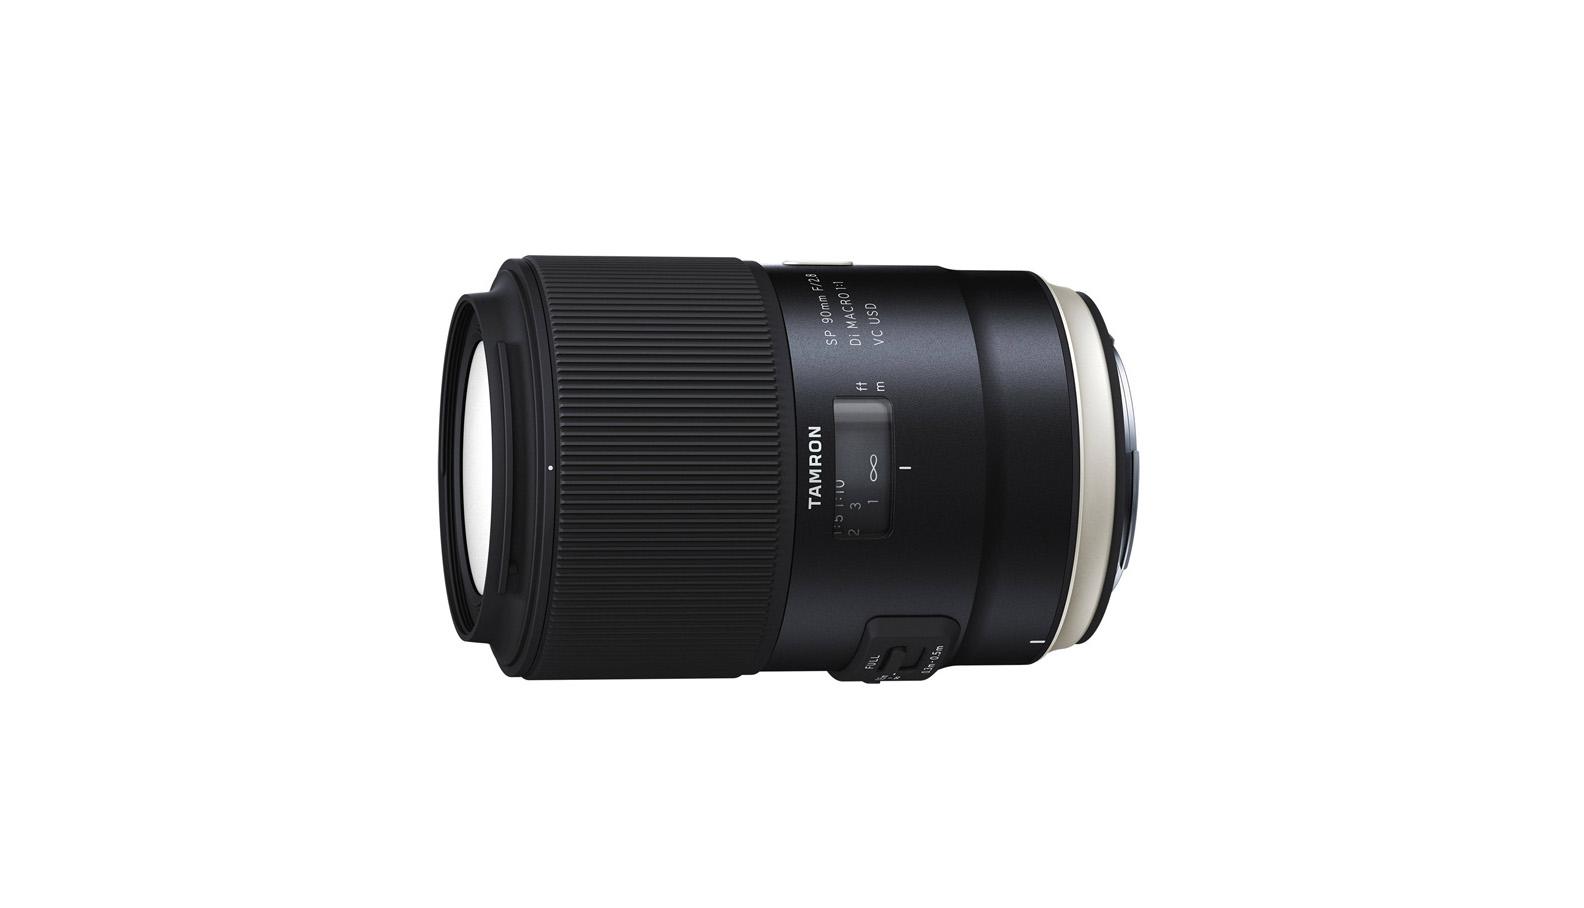 لنز Tamron SP 90mm f/2.8 Di VC USD Macro for Canon